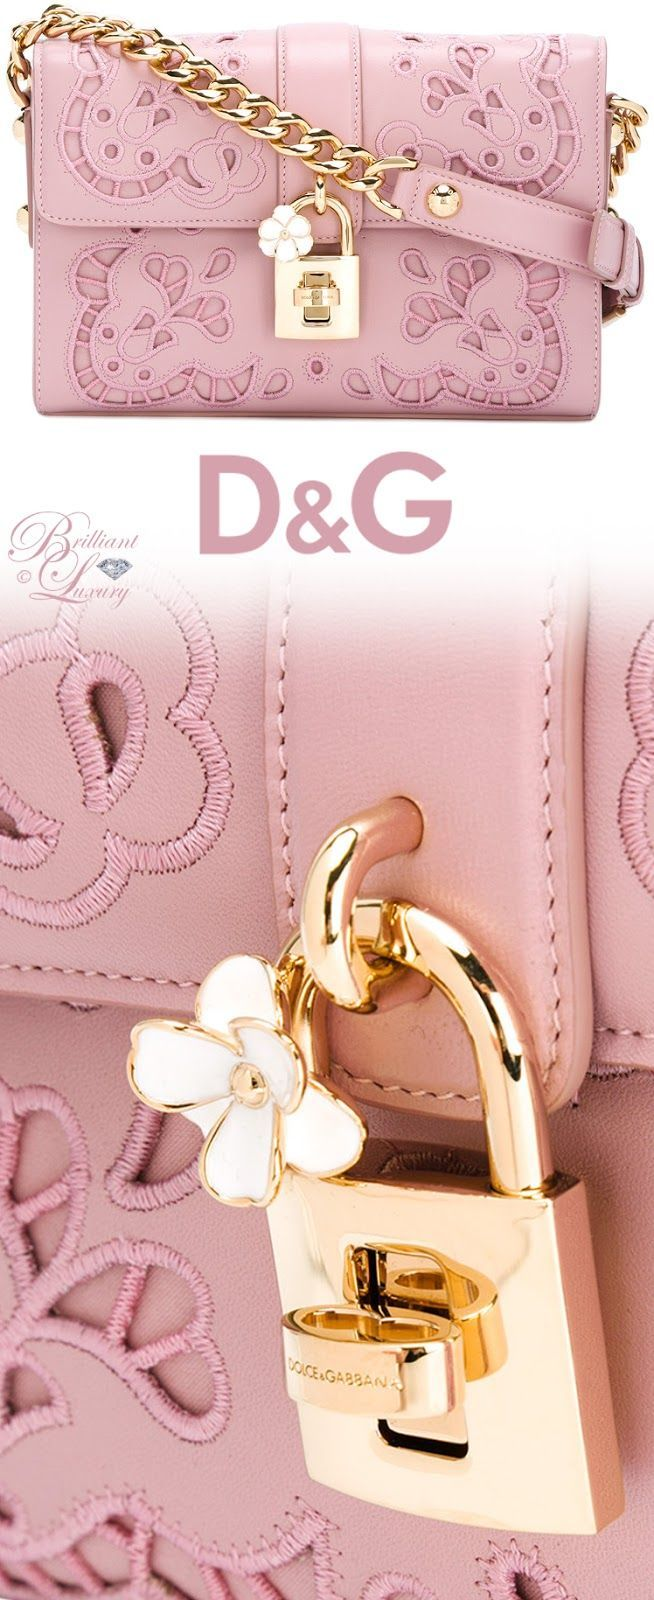 Brilliant Luxury by Emmy DE ♦ Dolce & Gabbana Broderie Cutout Shoulder Bag